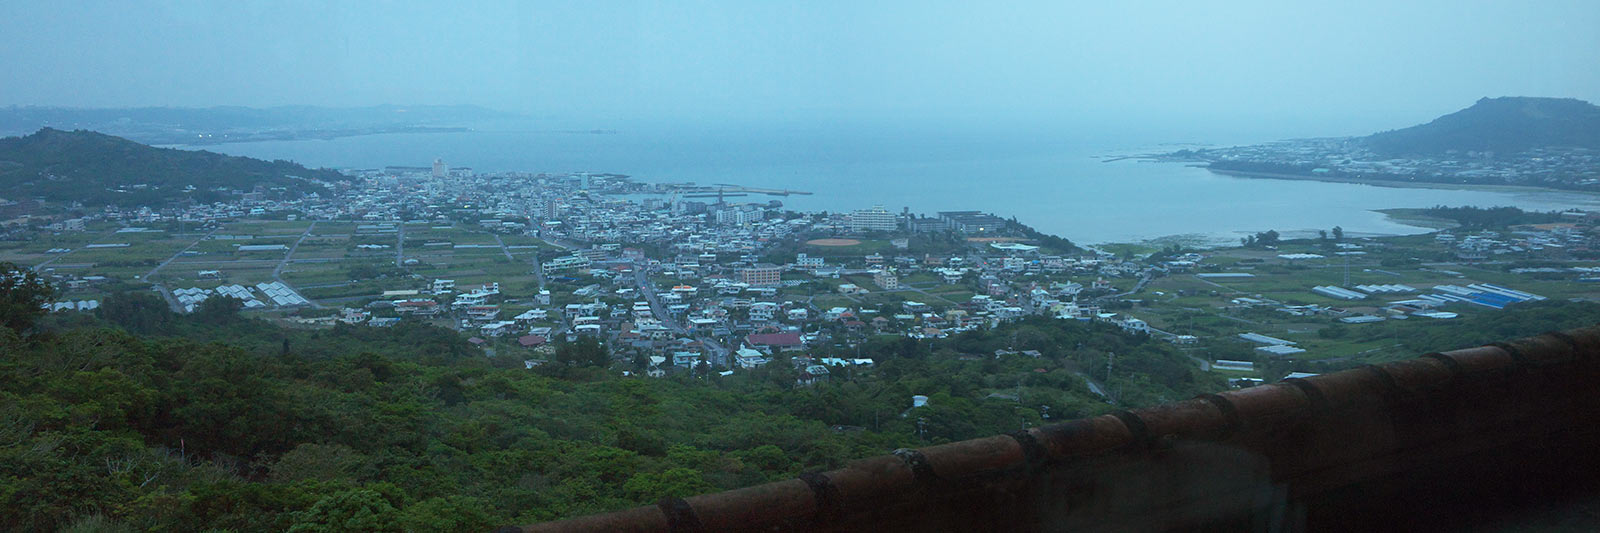 япония, Gangala valley, japan, okinawa, пещера, окинава, okinawa world